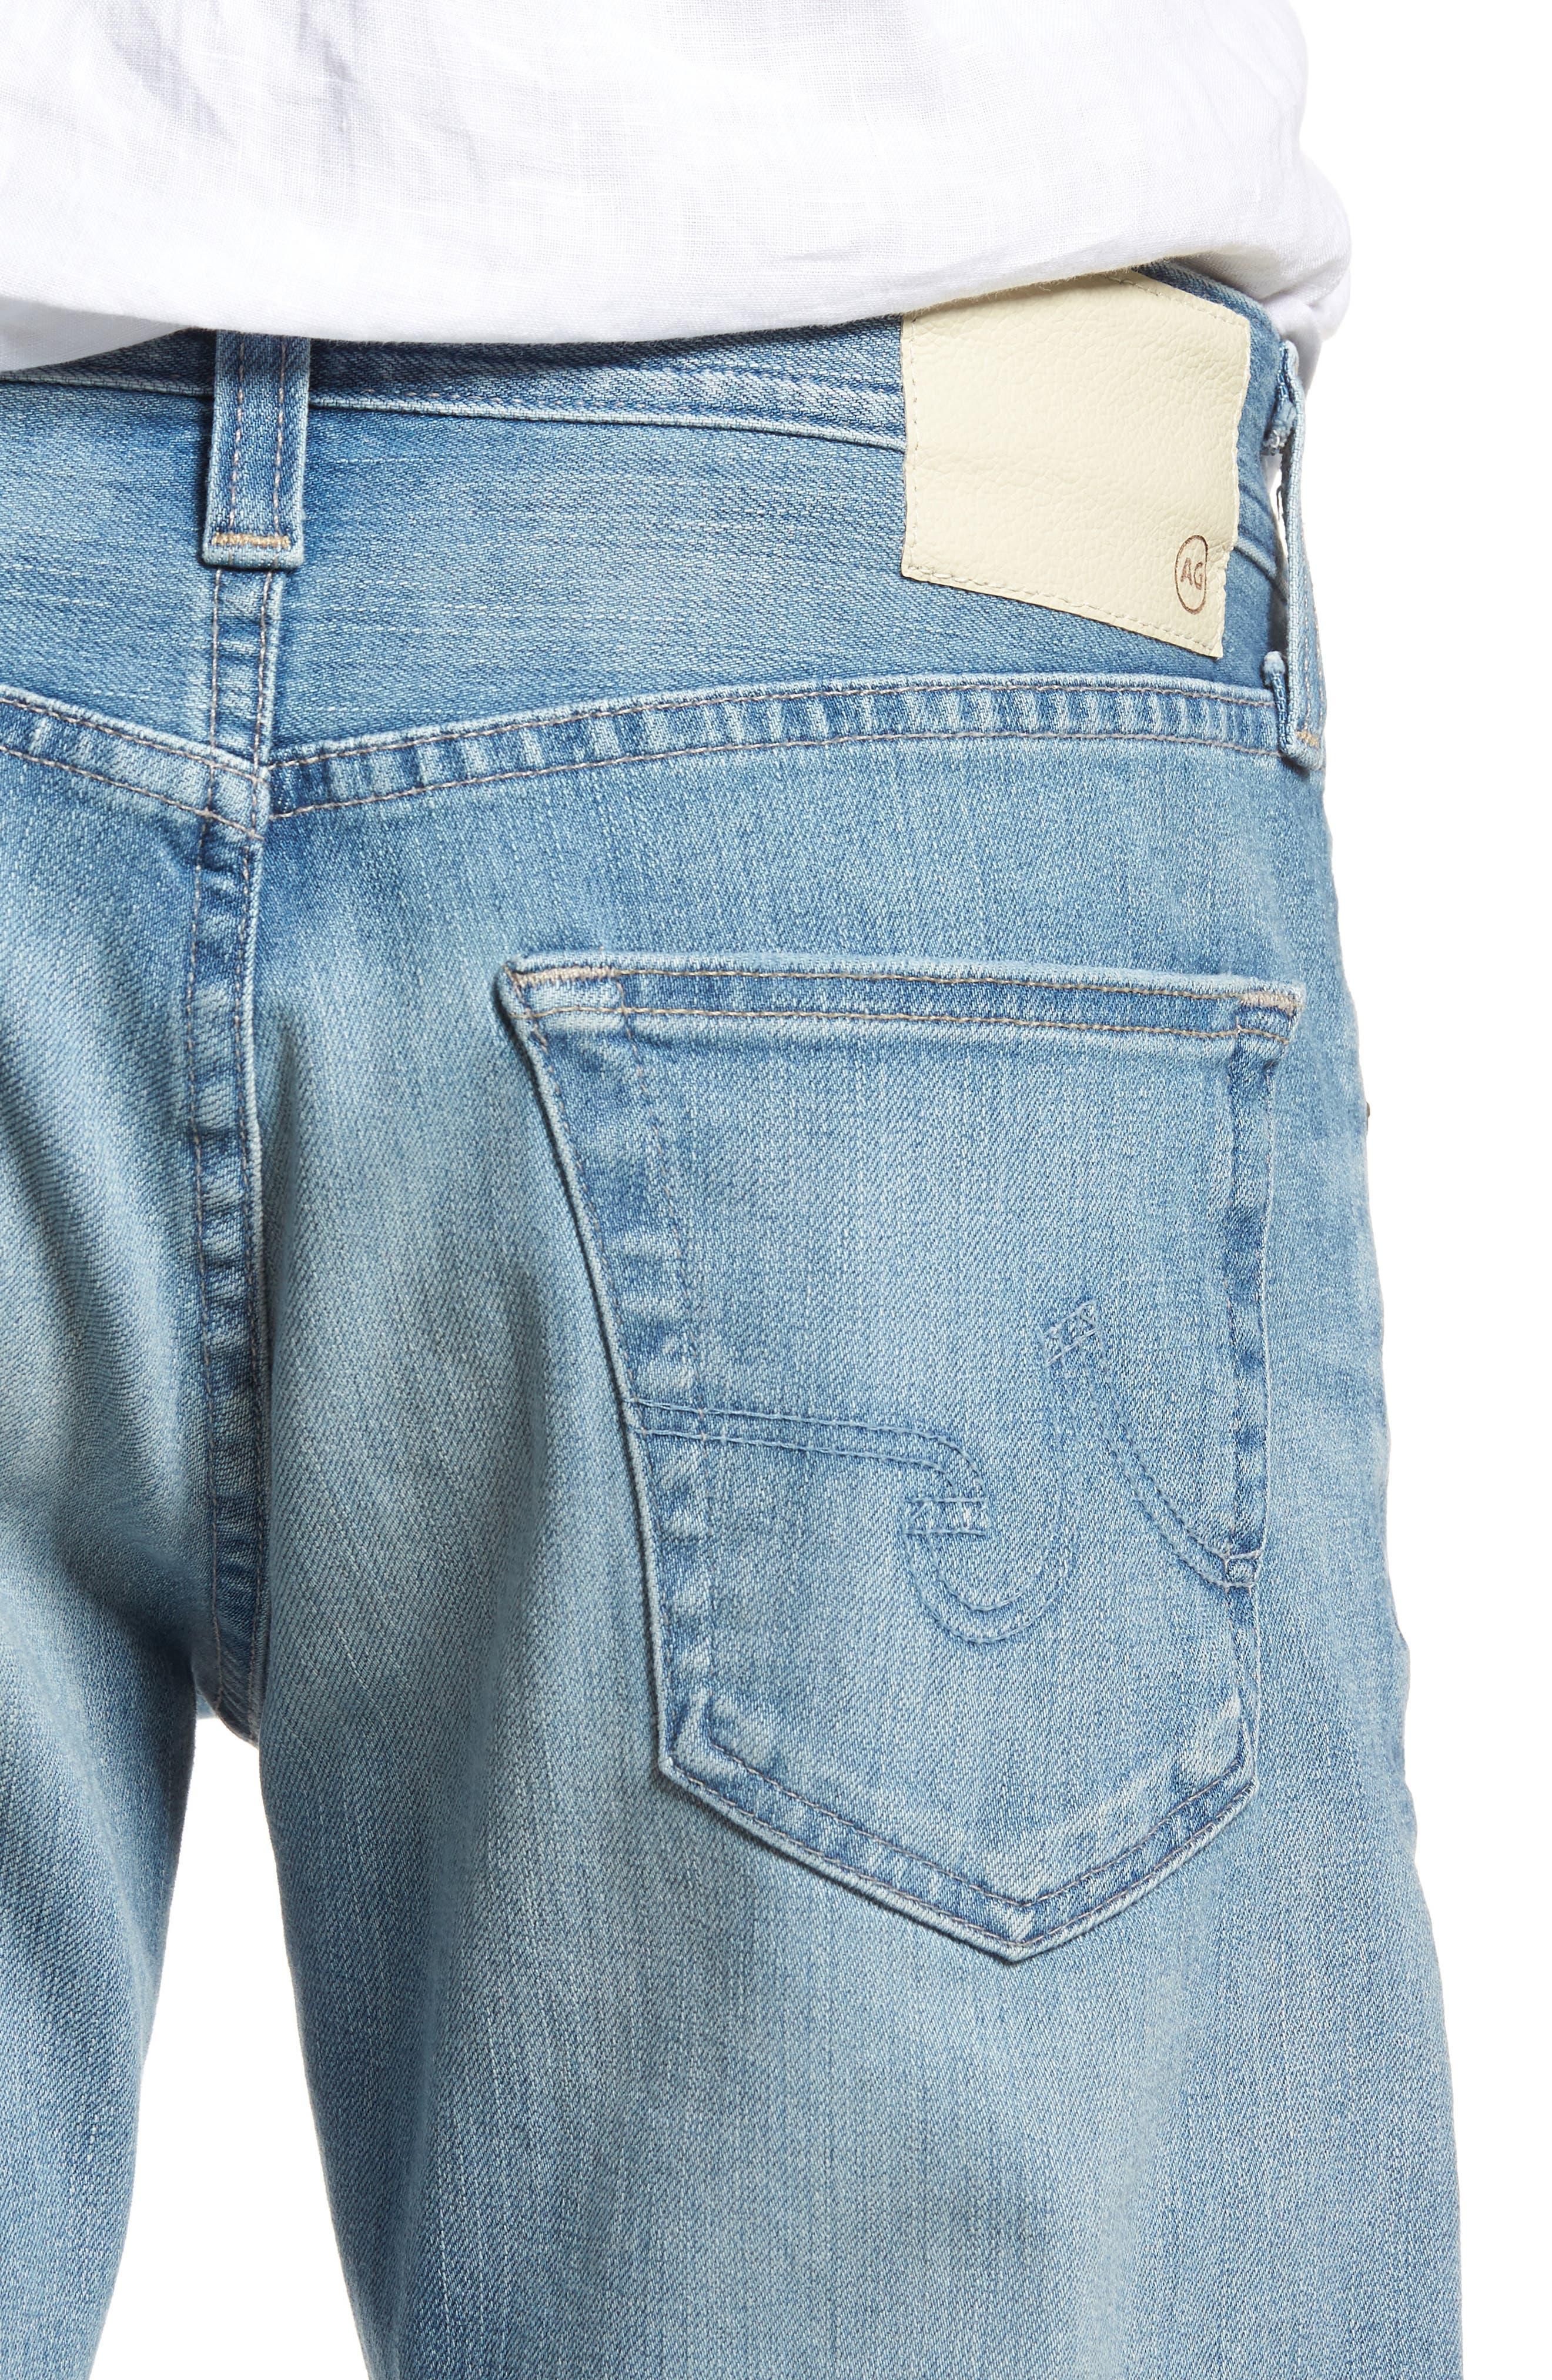 Graduate Slim Straight Leg Jeans,                             Alternate thumbnail 4, color,                             19 YEARS CHANNEL